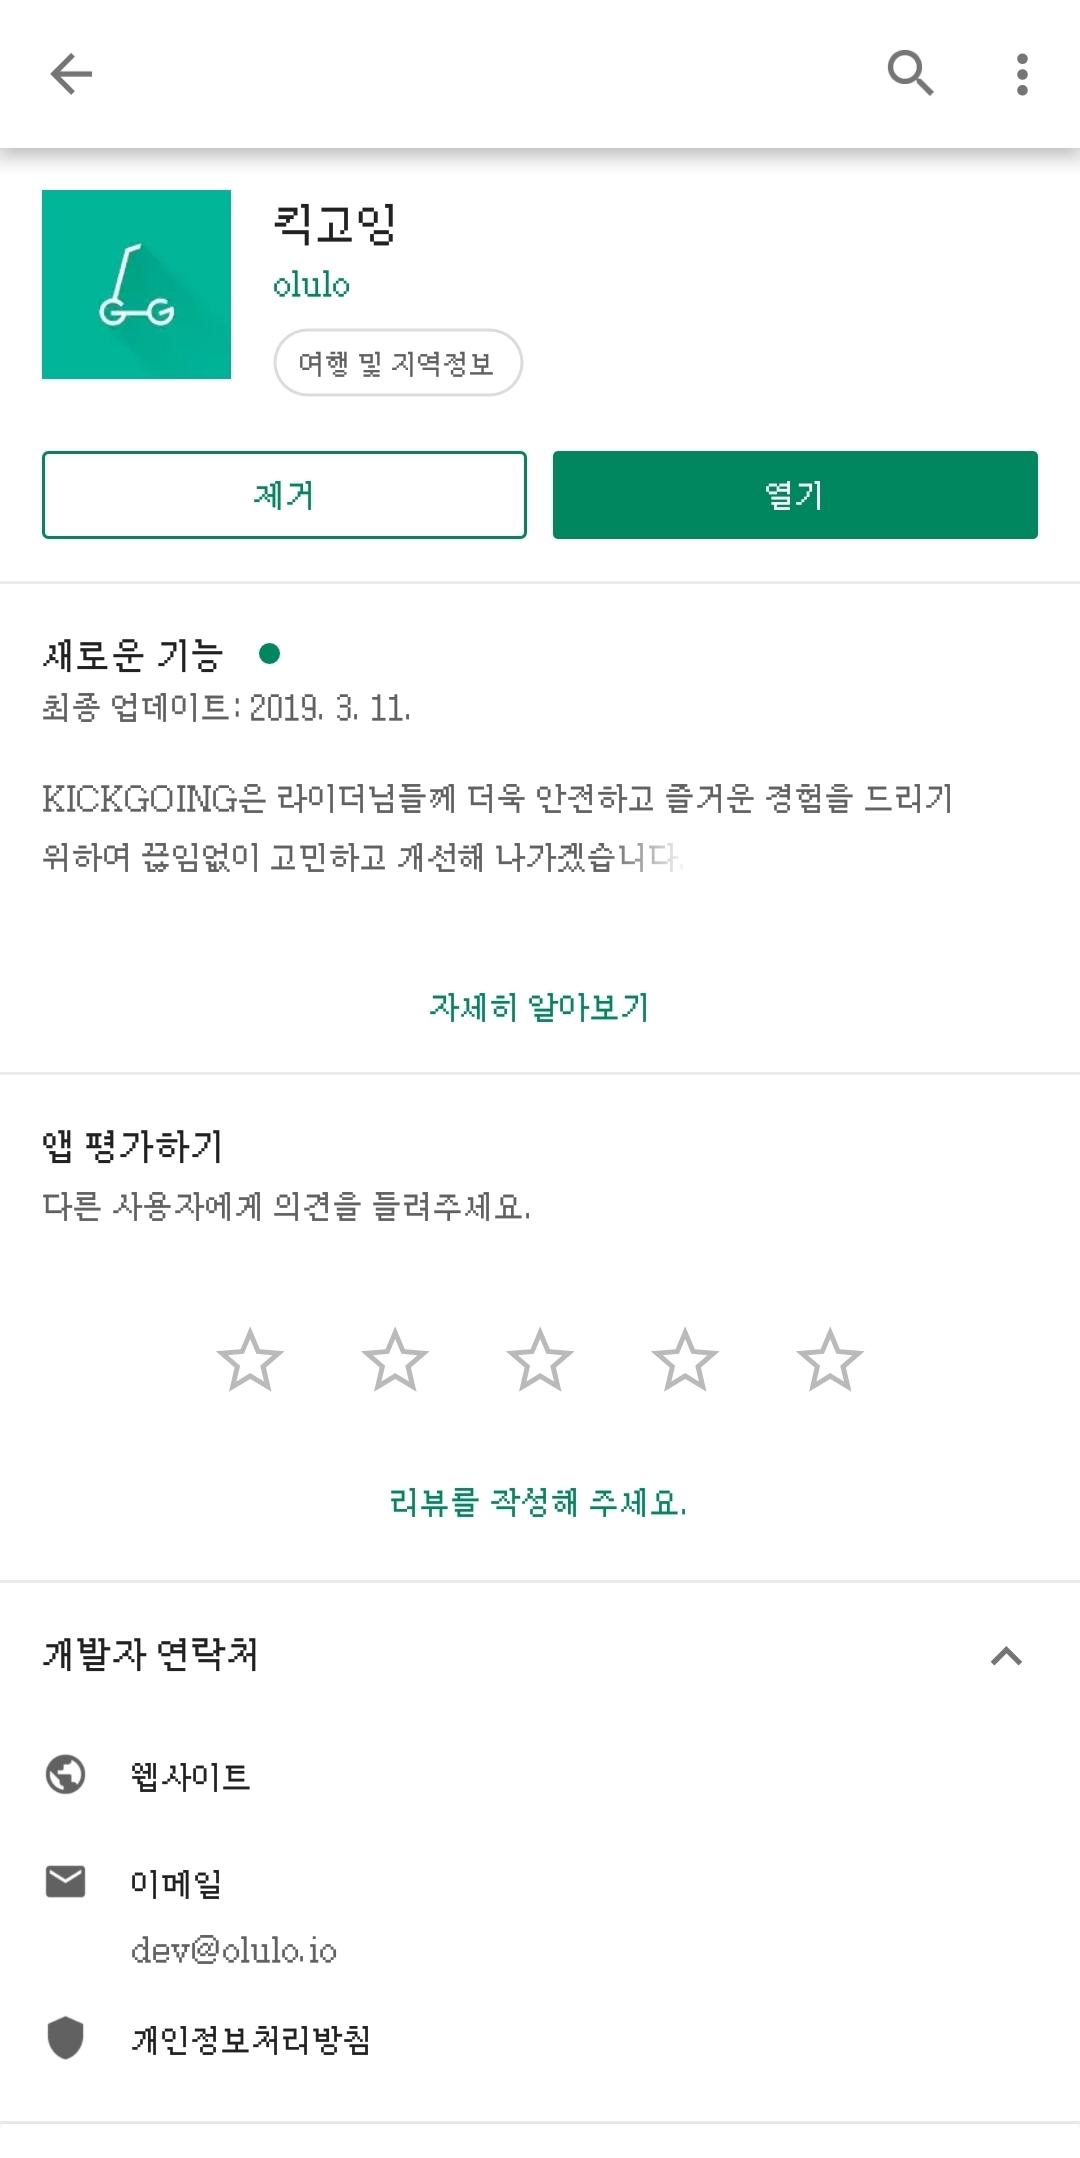 KICKGOING : 전동 킥보드로 출퇴근 하자!!